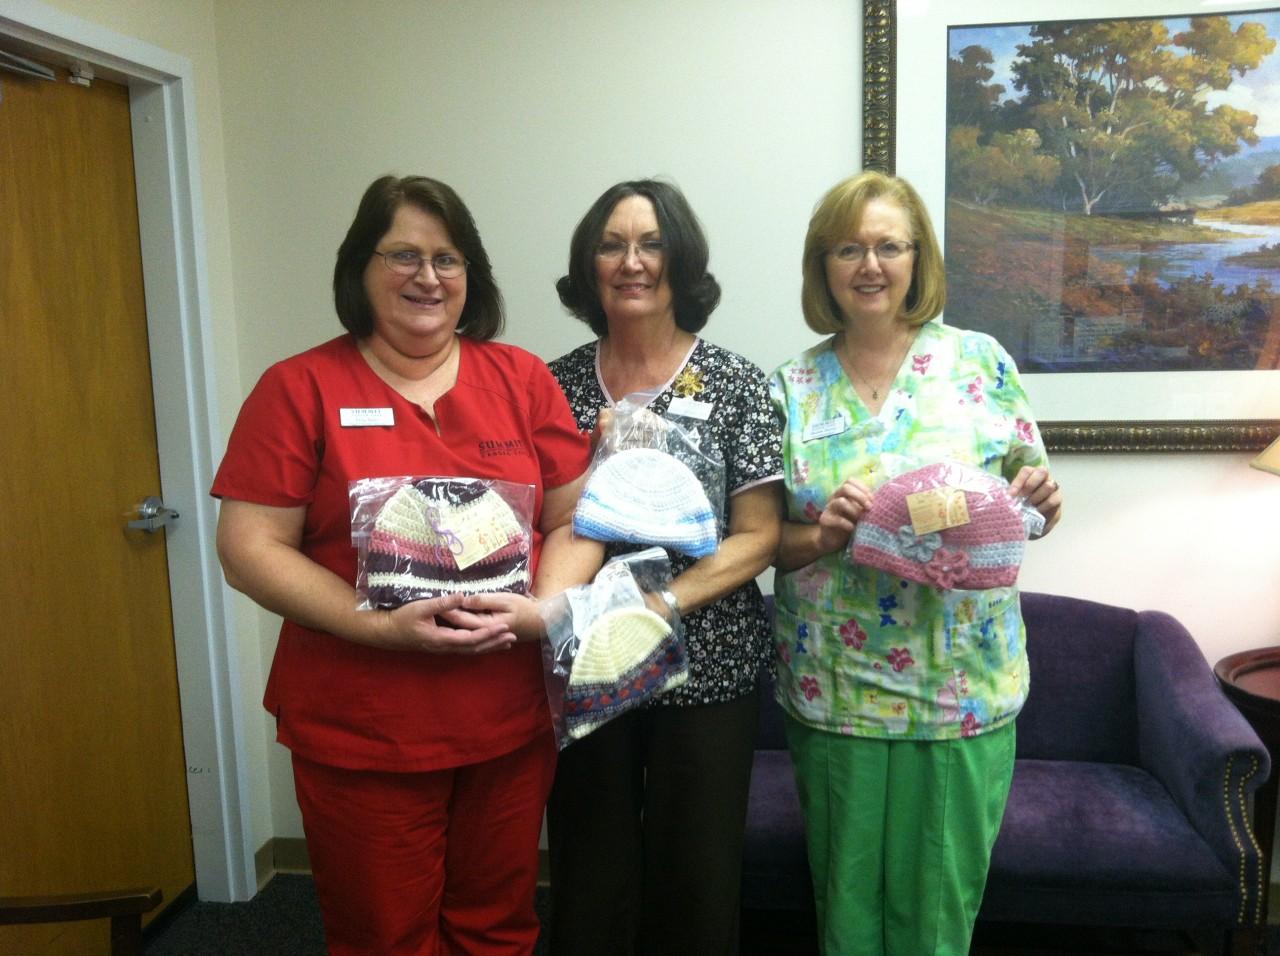 The Wonderful Nurses at Summit Cancer Care, Statesboro, Georgia